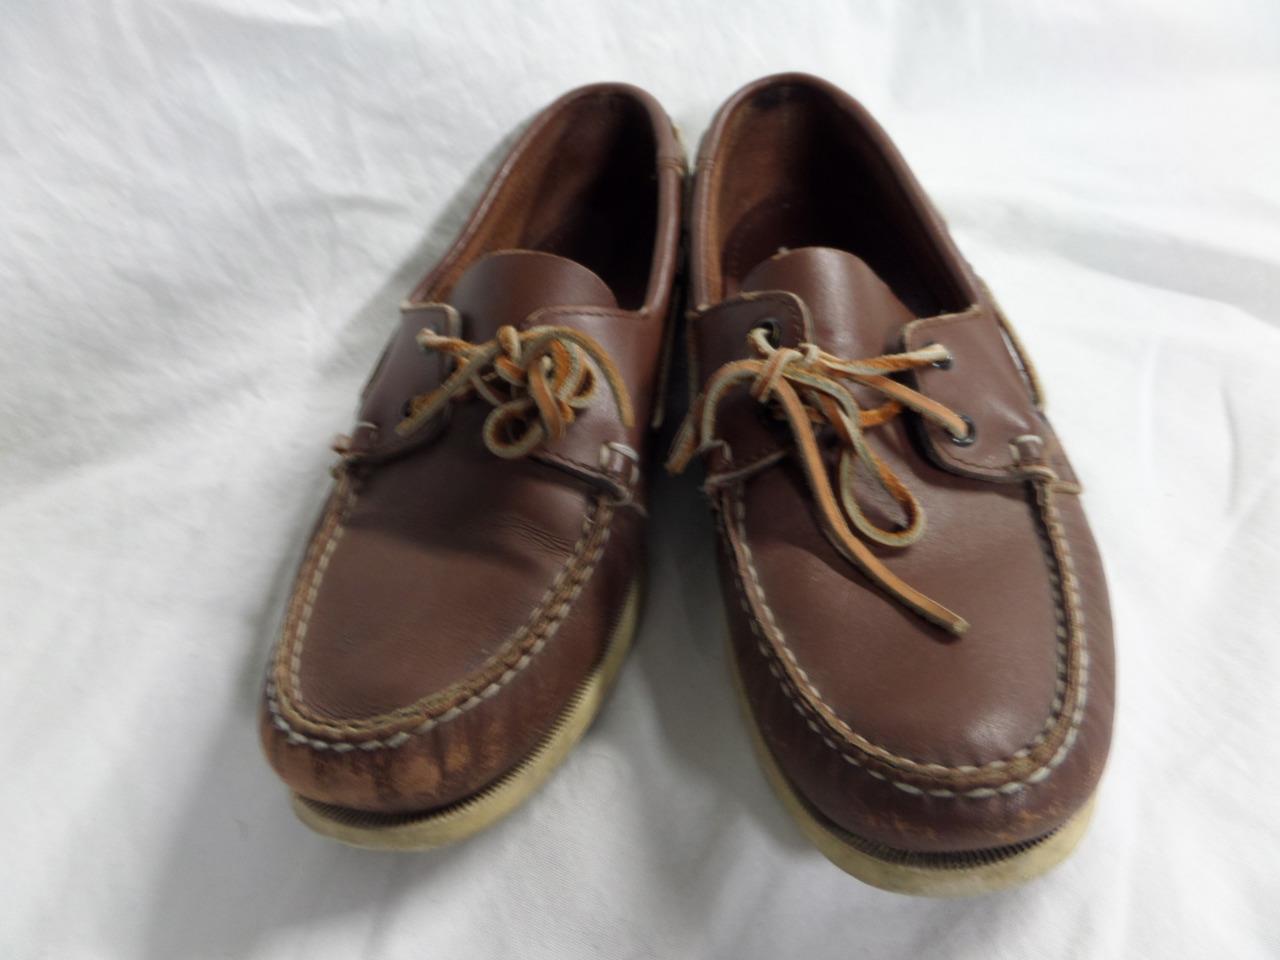 sconto online di vendita Vintage BROOKS BROOKS BROOKS BROTHERS Boat scarpe 10 D Marrone Top Sider Speery  prendi l'ultimo